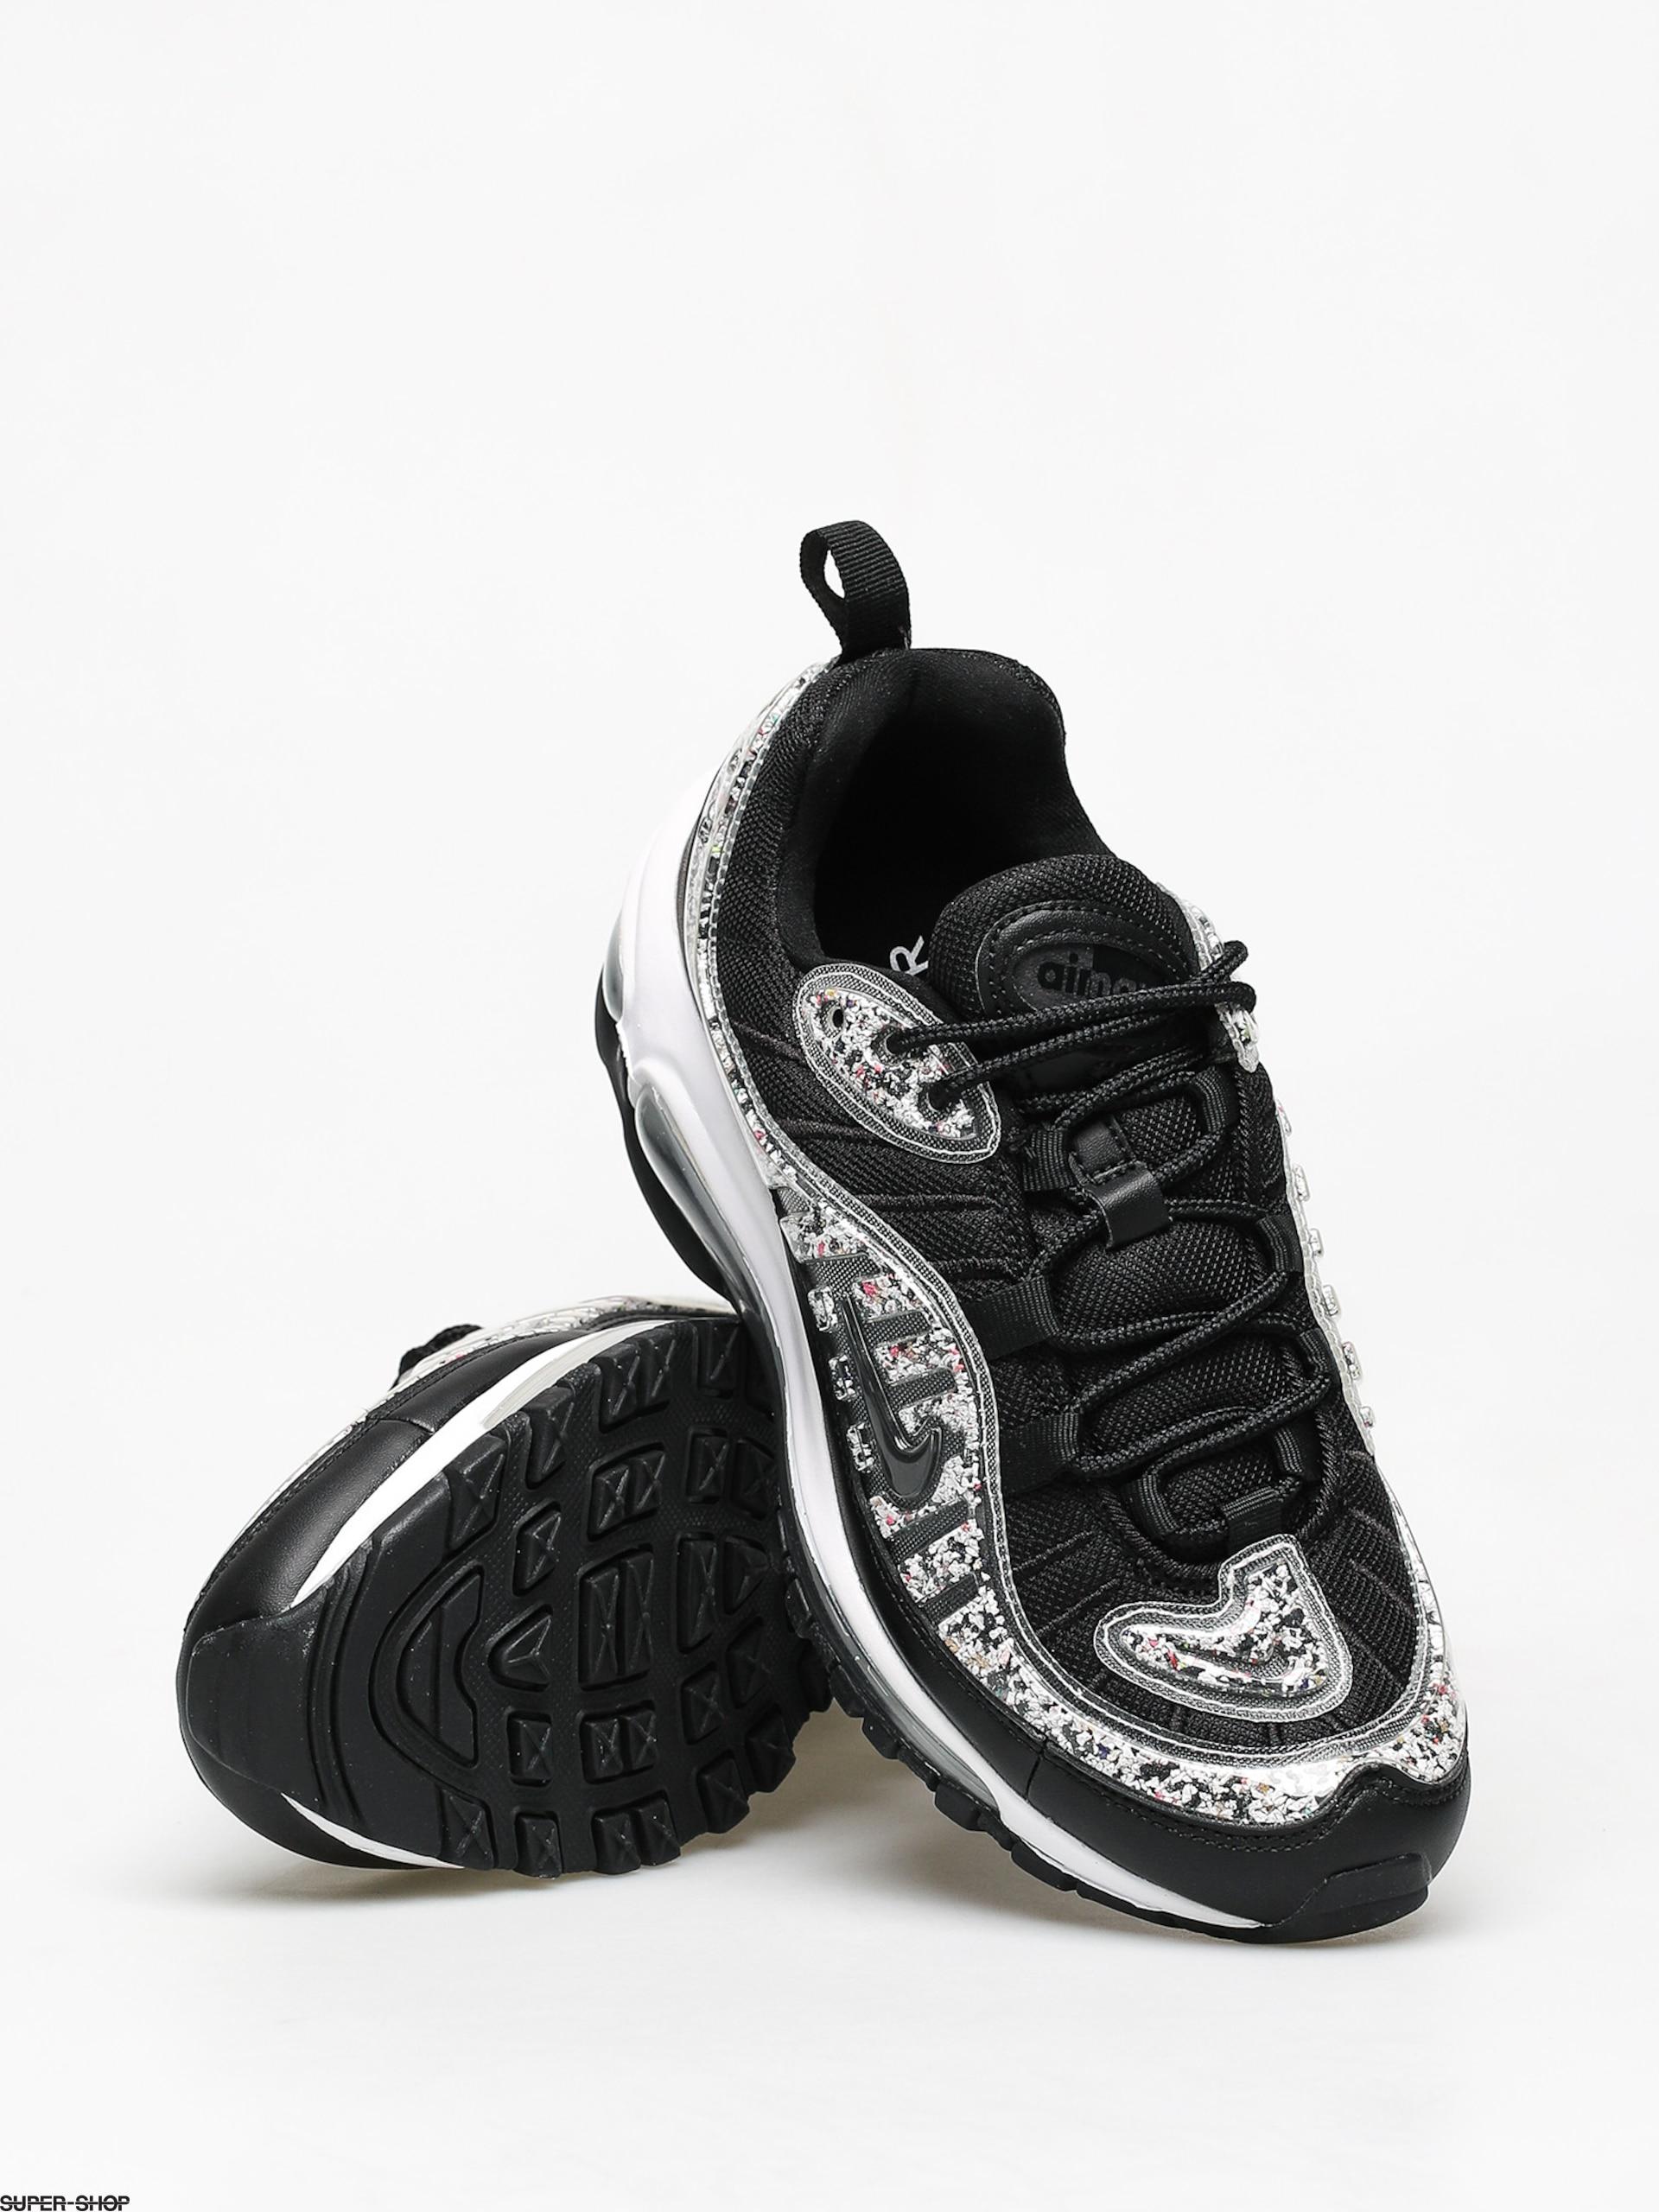 Nike Air Max 98 Lx Wmn Shoes (black/black white)